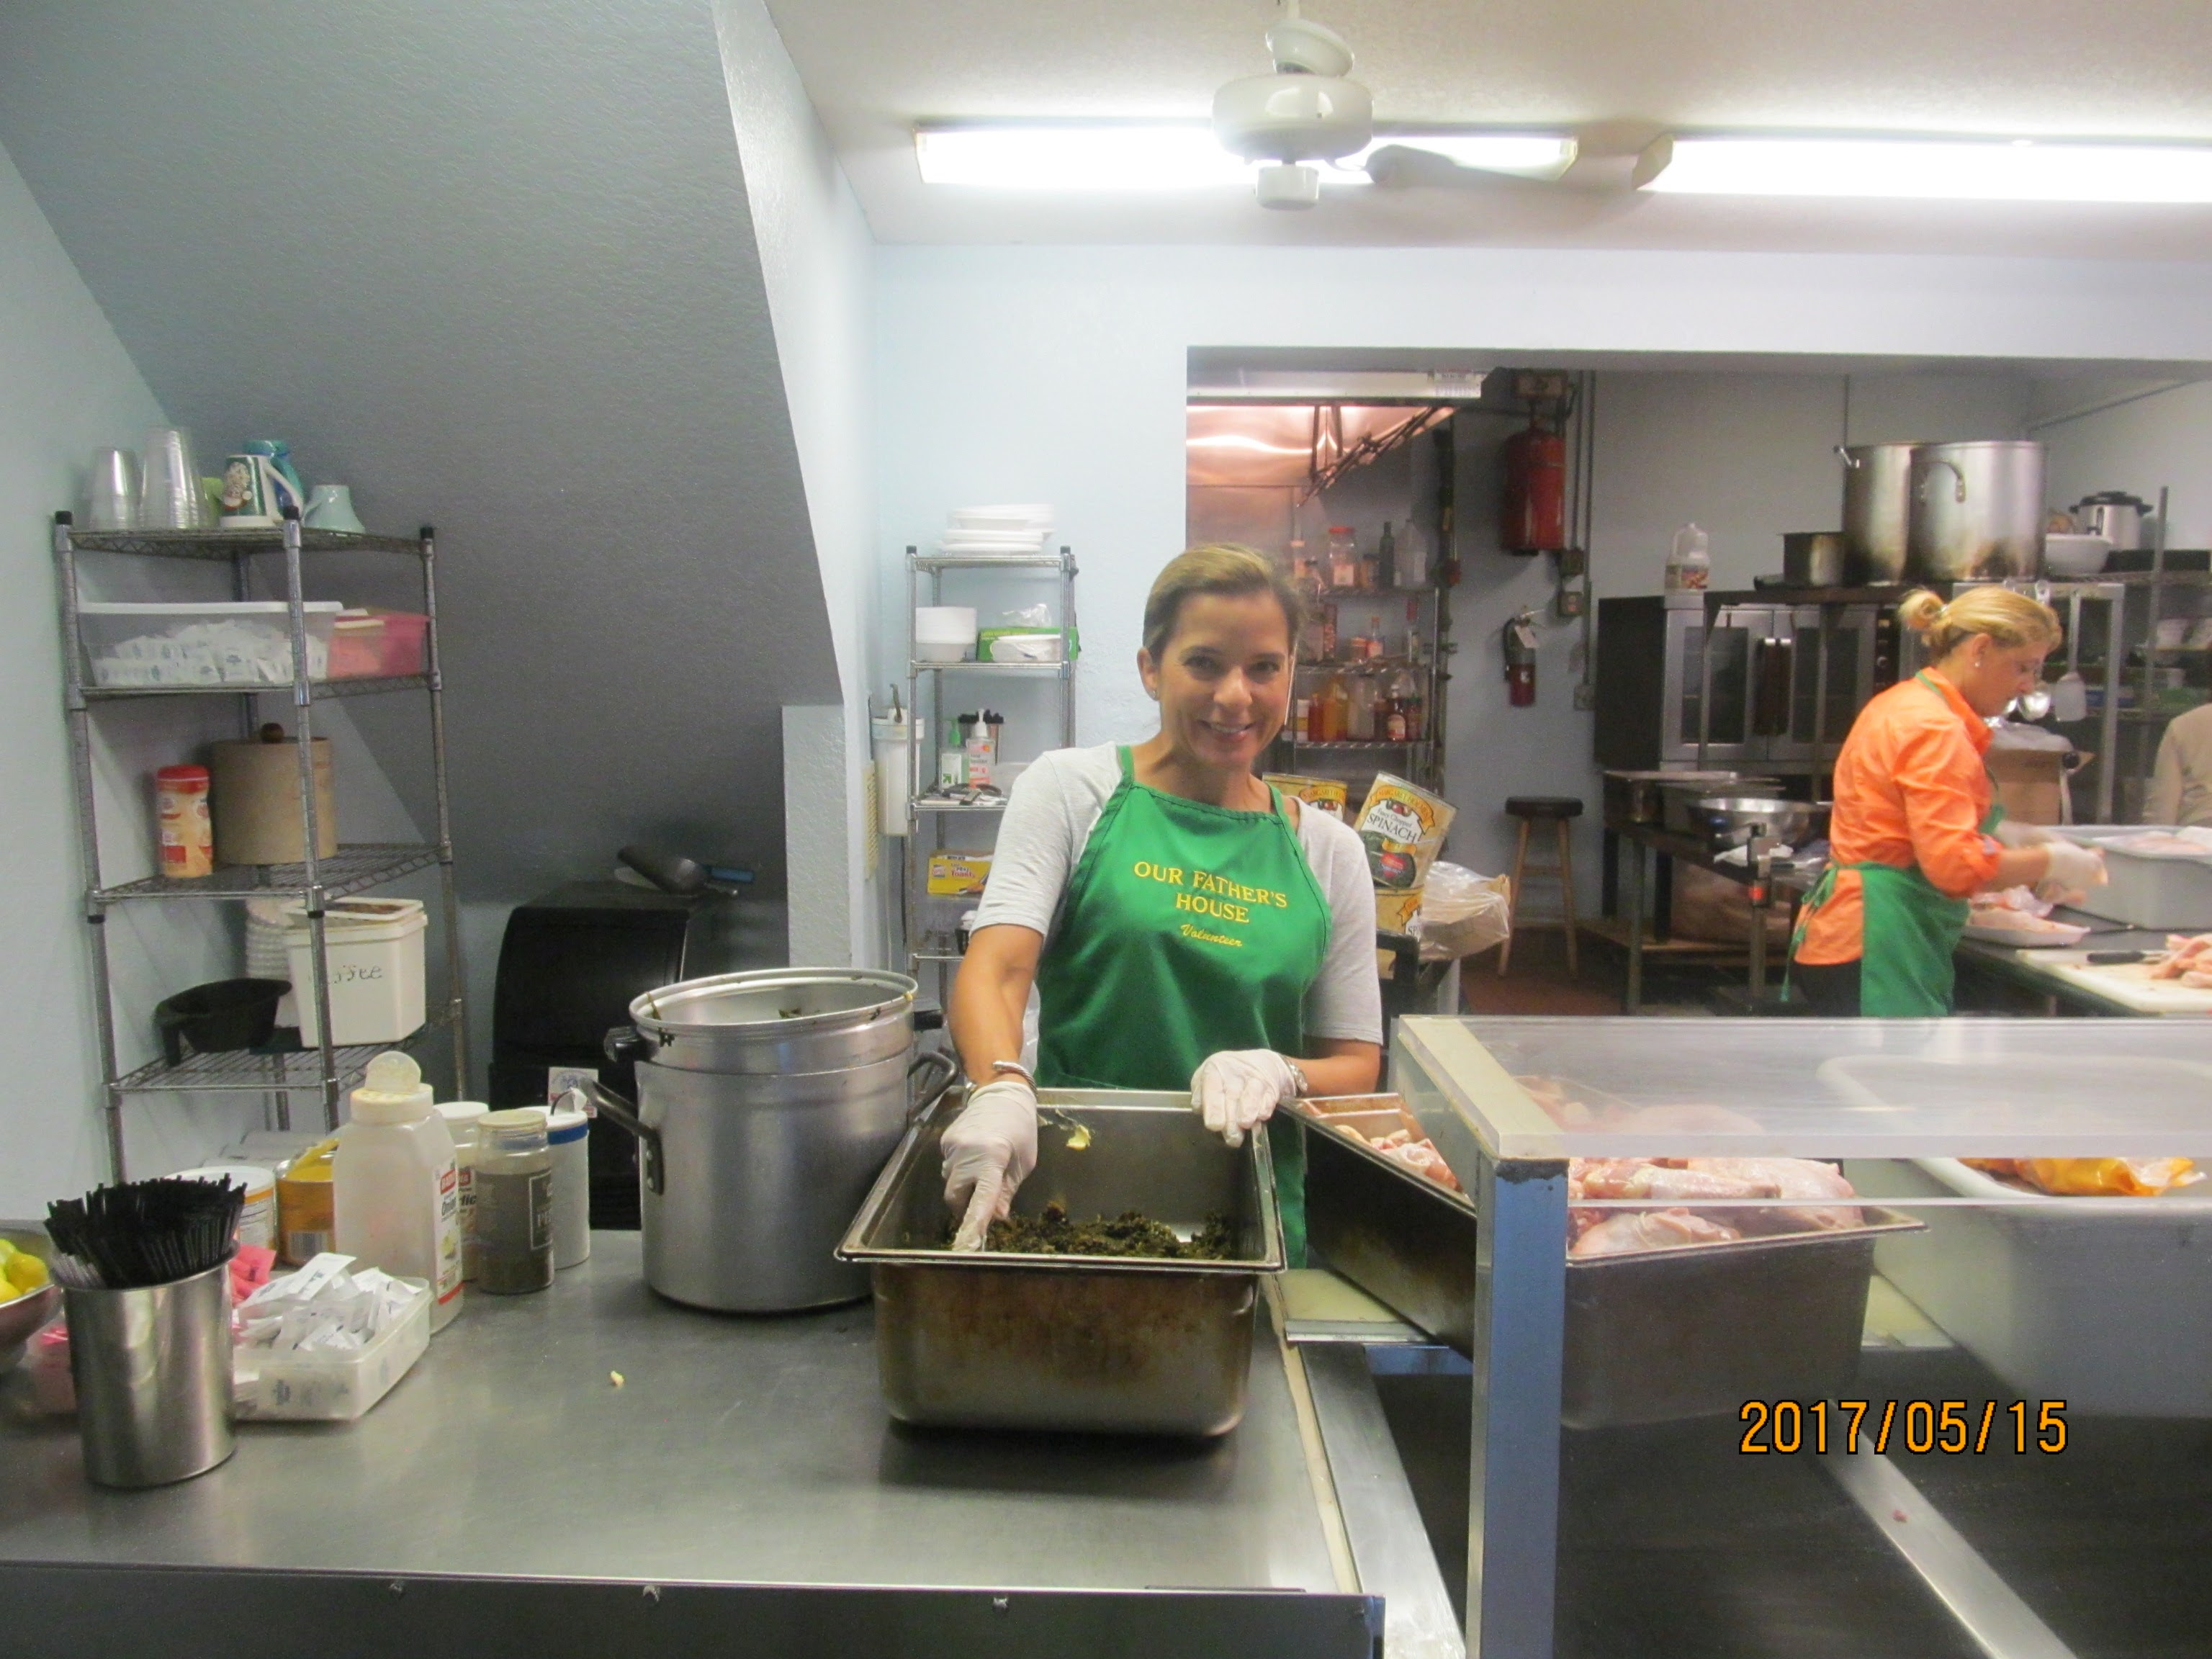 Soup kitchen volunteers staff preparing food for homeless people.